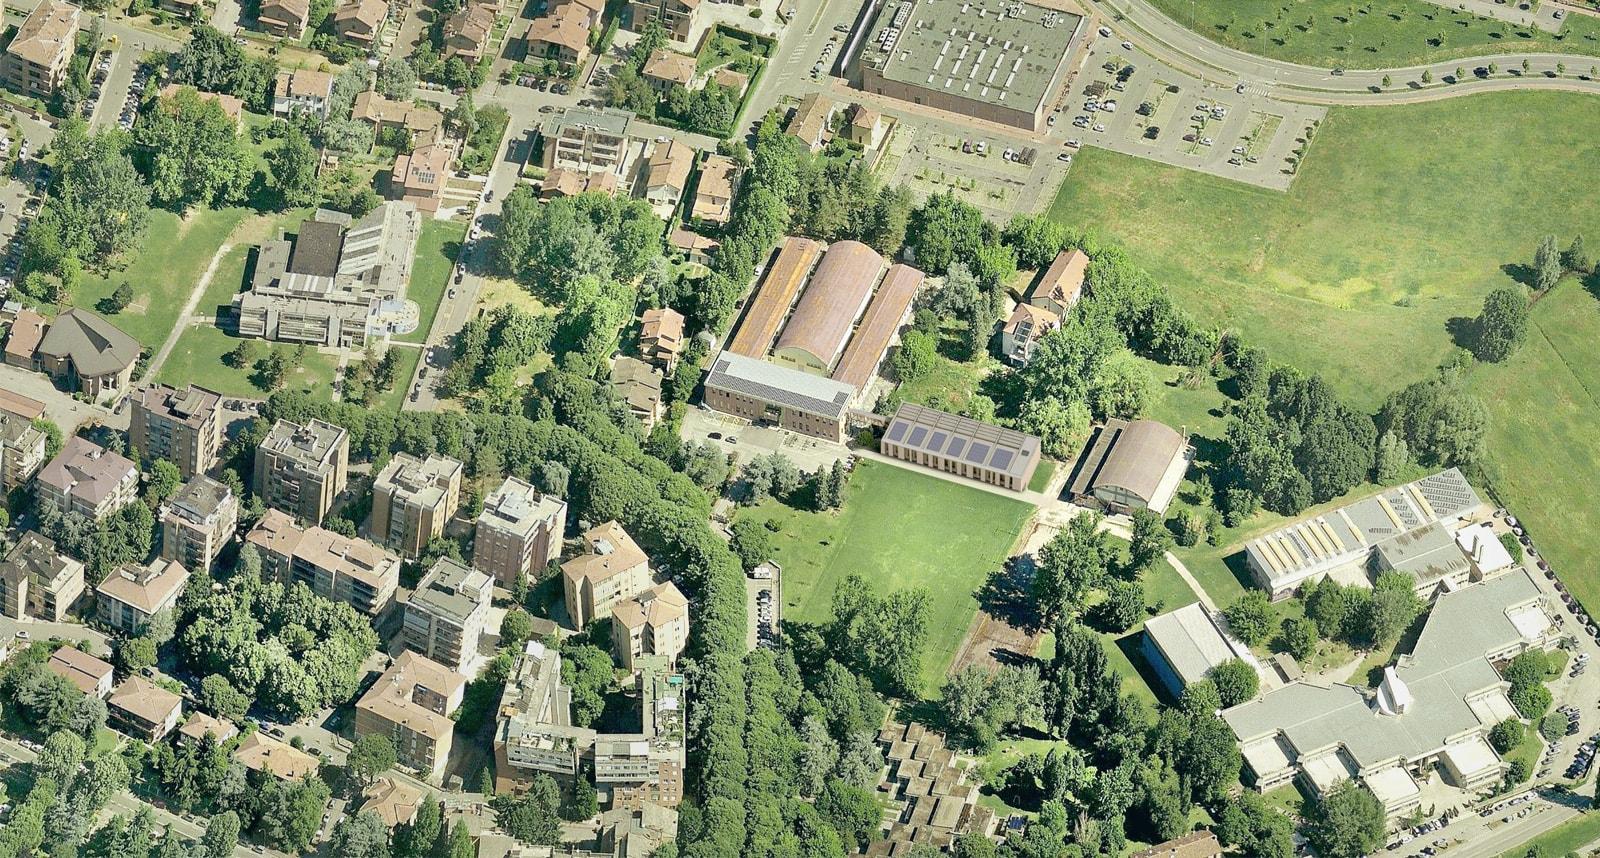 scuole-innovative-ferrara-aerial